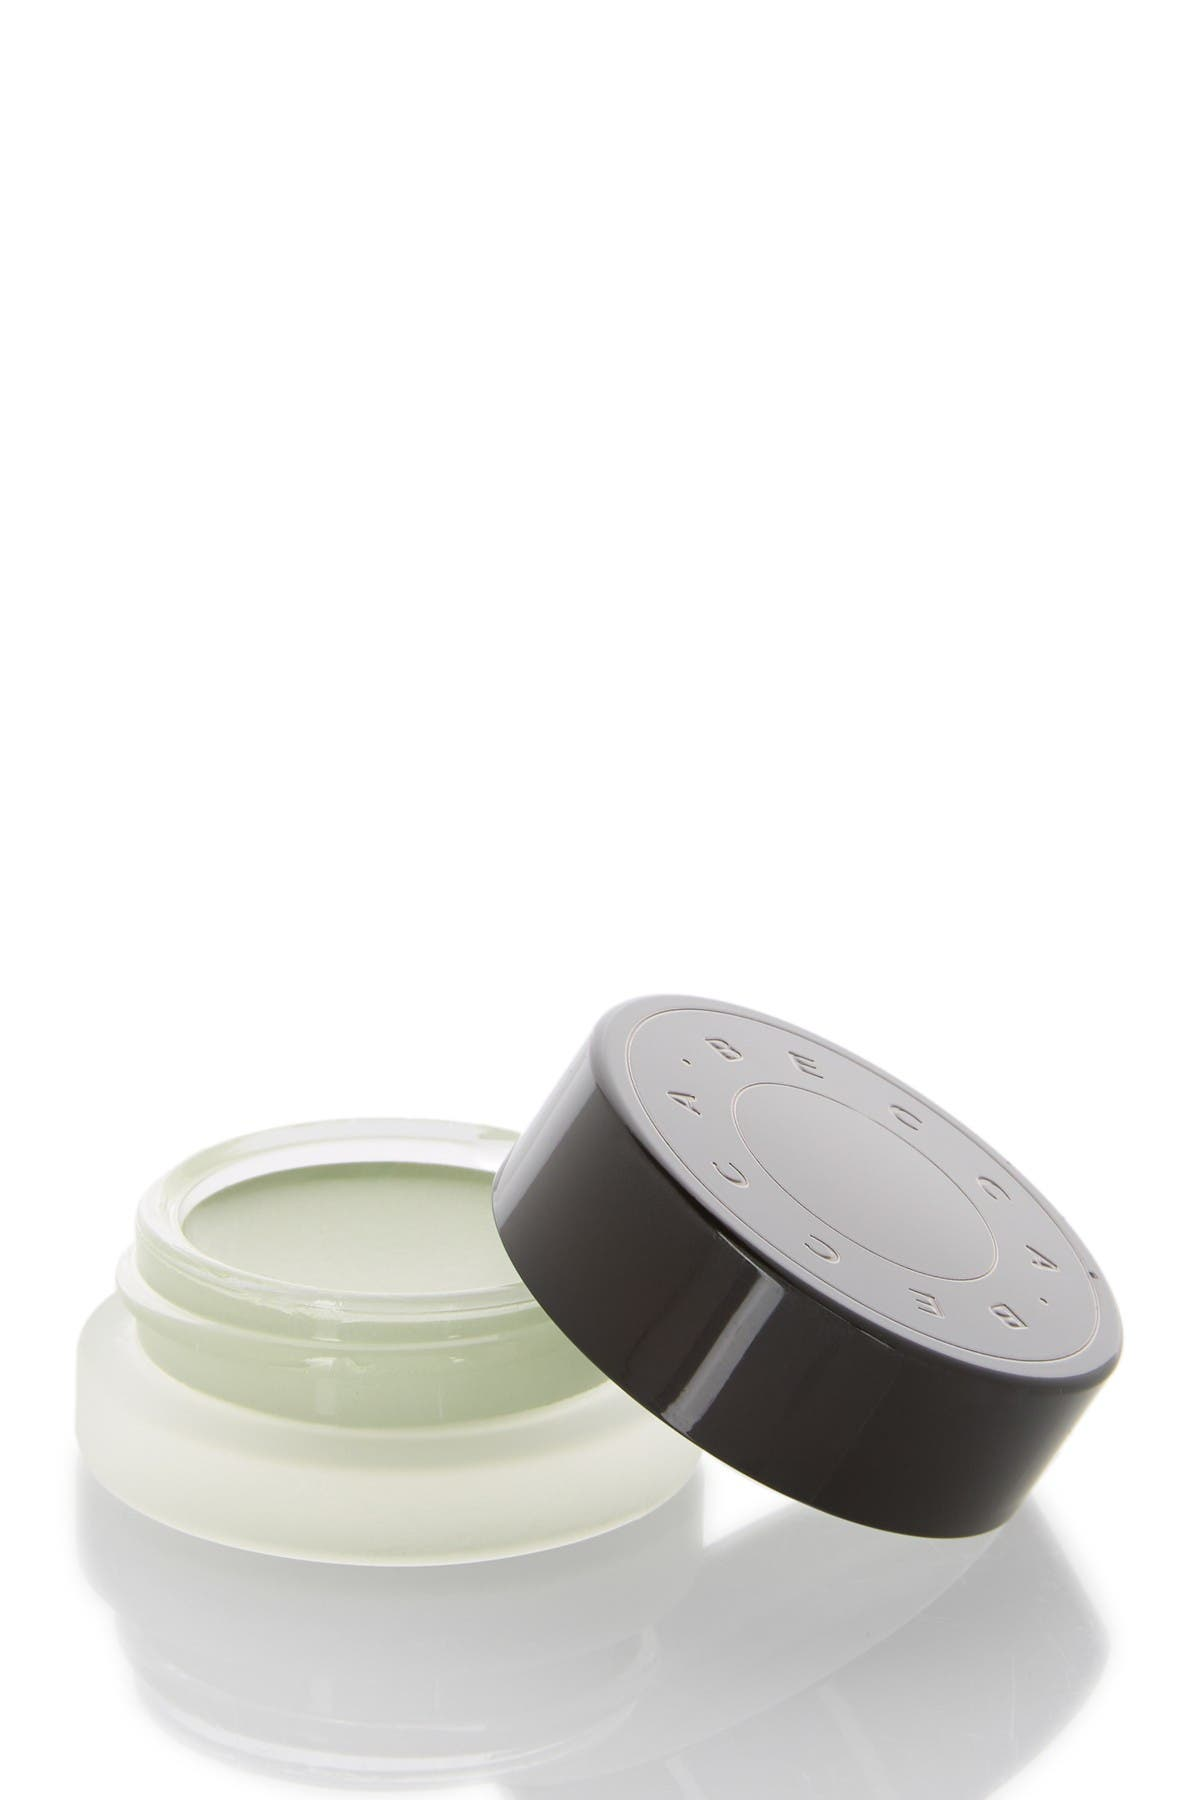 Image of BECCA Cosmetics Backlight Colour Correcting Creme - Pistachio